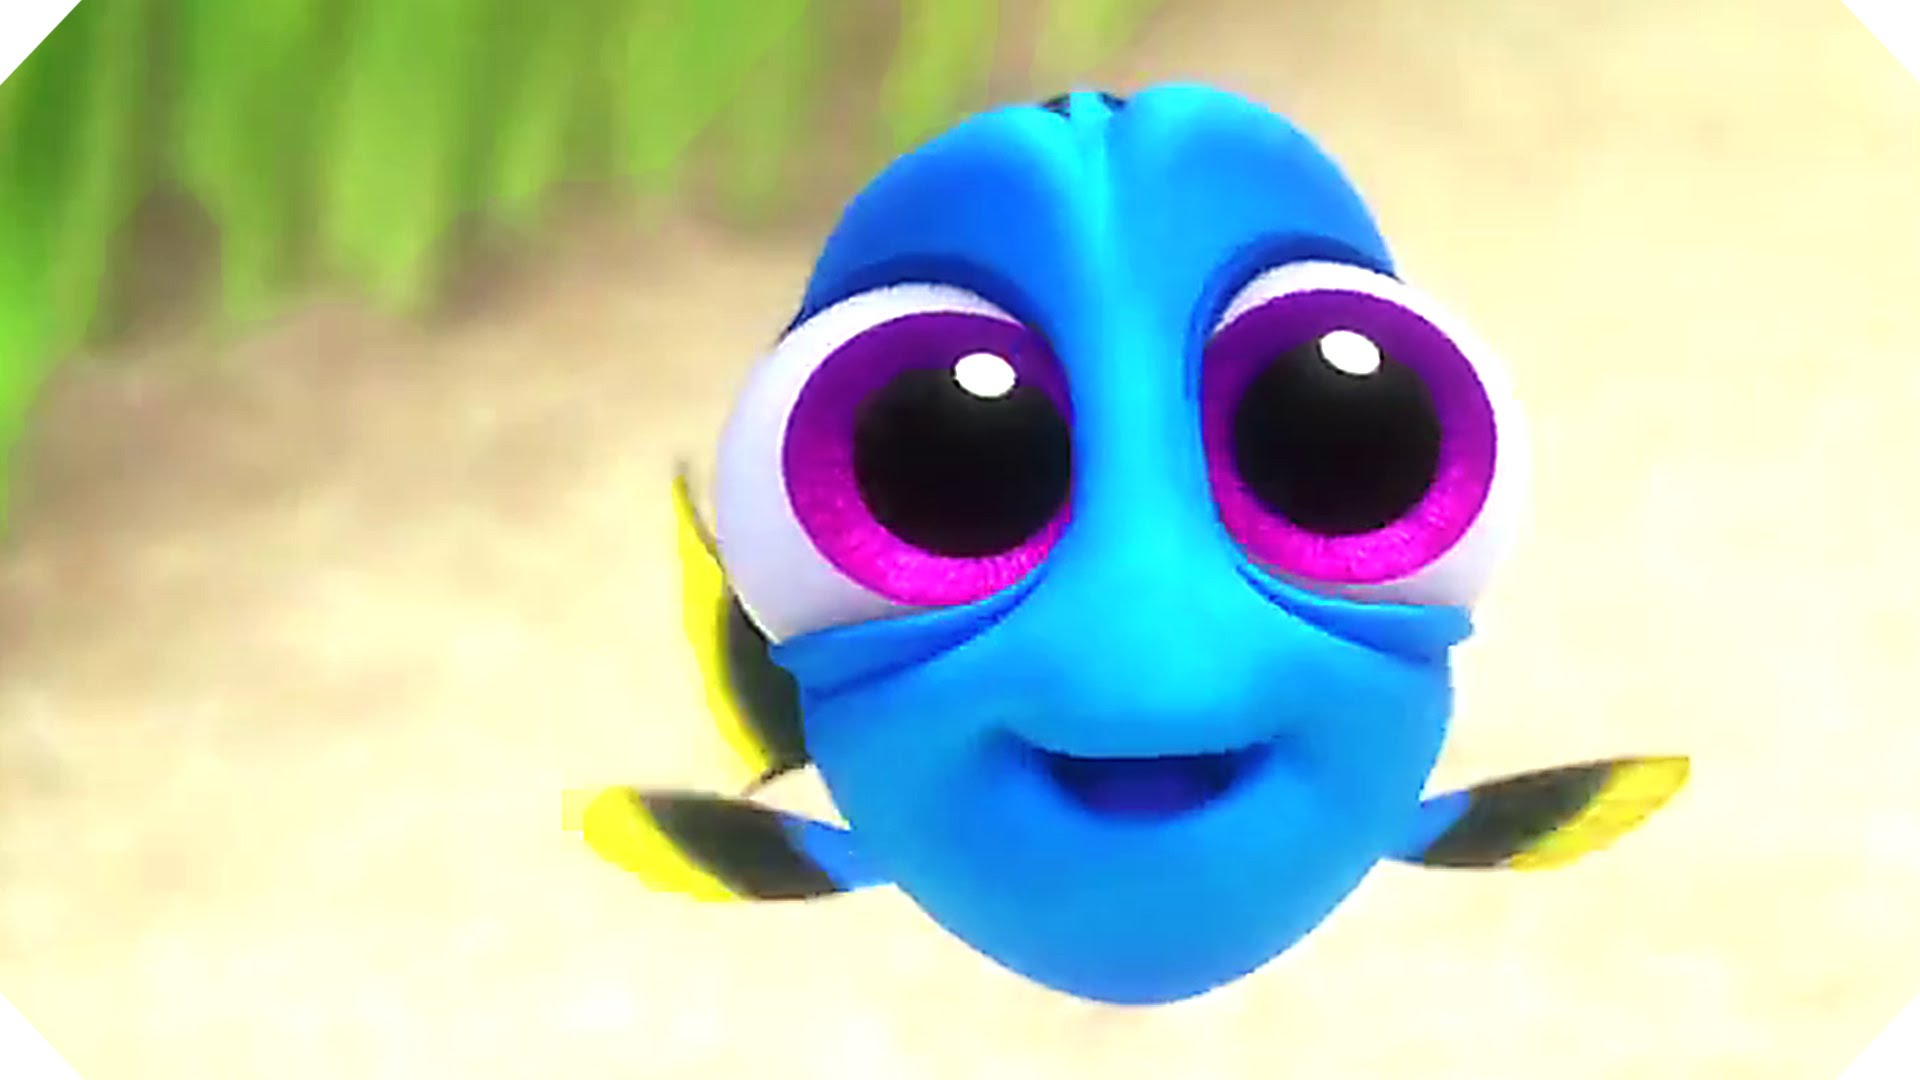 Disney Pixar's FINDING DORY - BABY Dory Movie Clip ! - YouTube